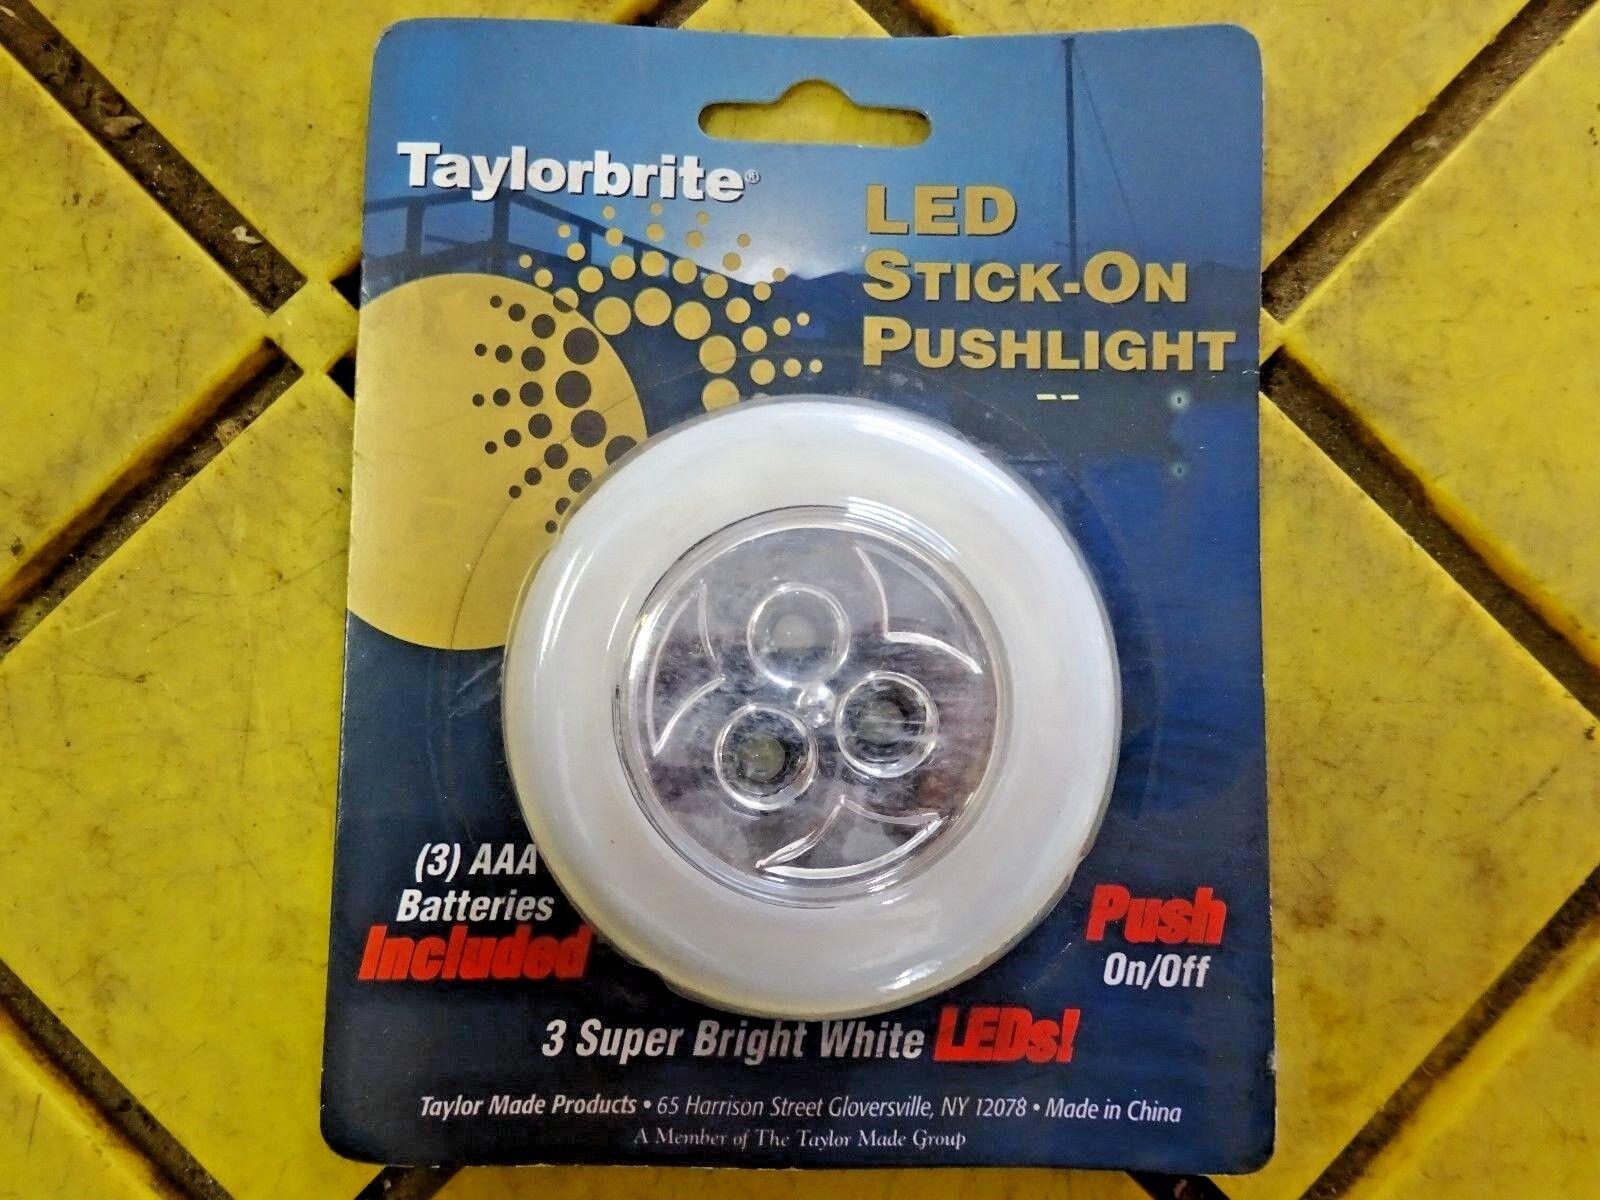 Taylorbrite LED Stick-On 3 LED Pushlight, White LSPW